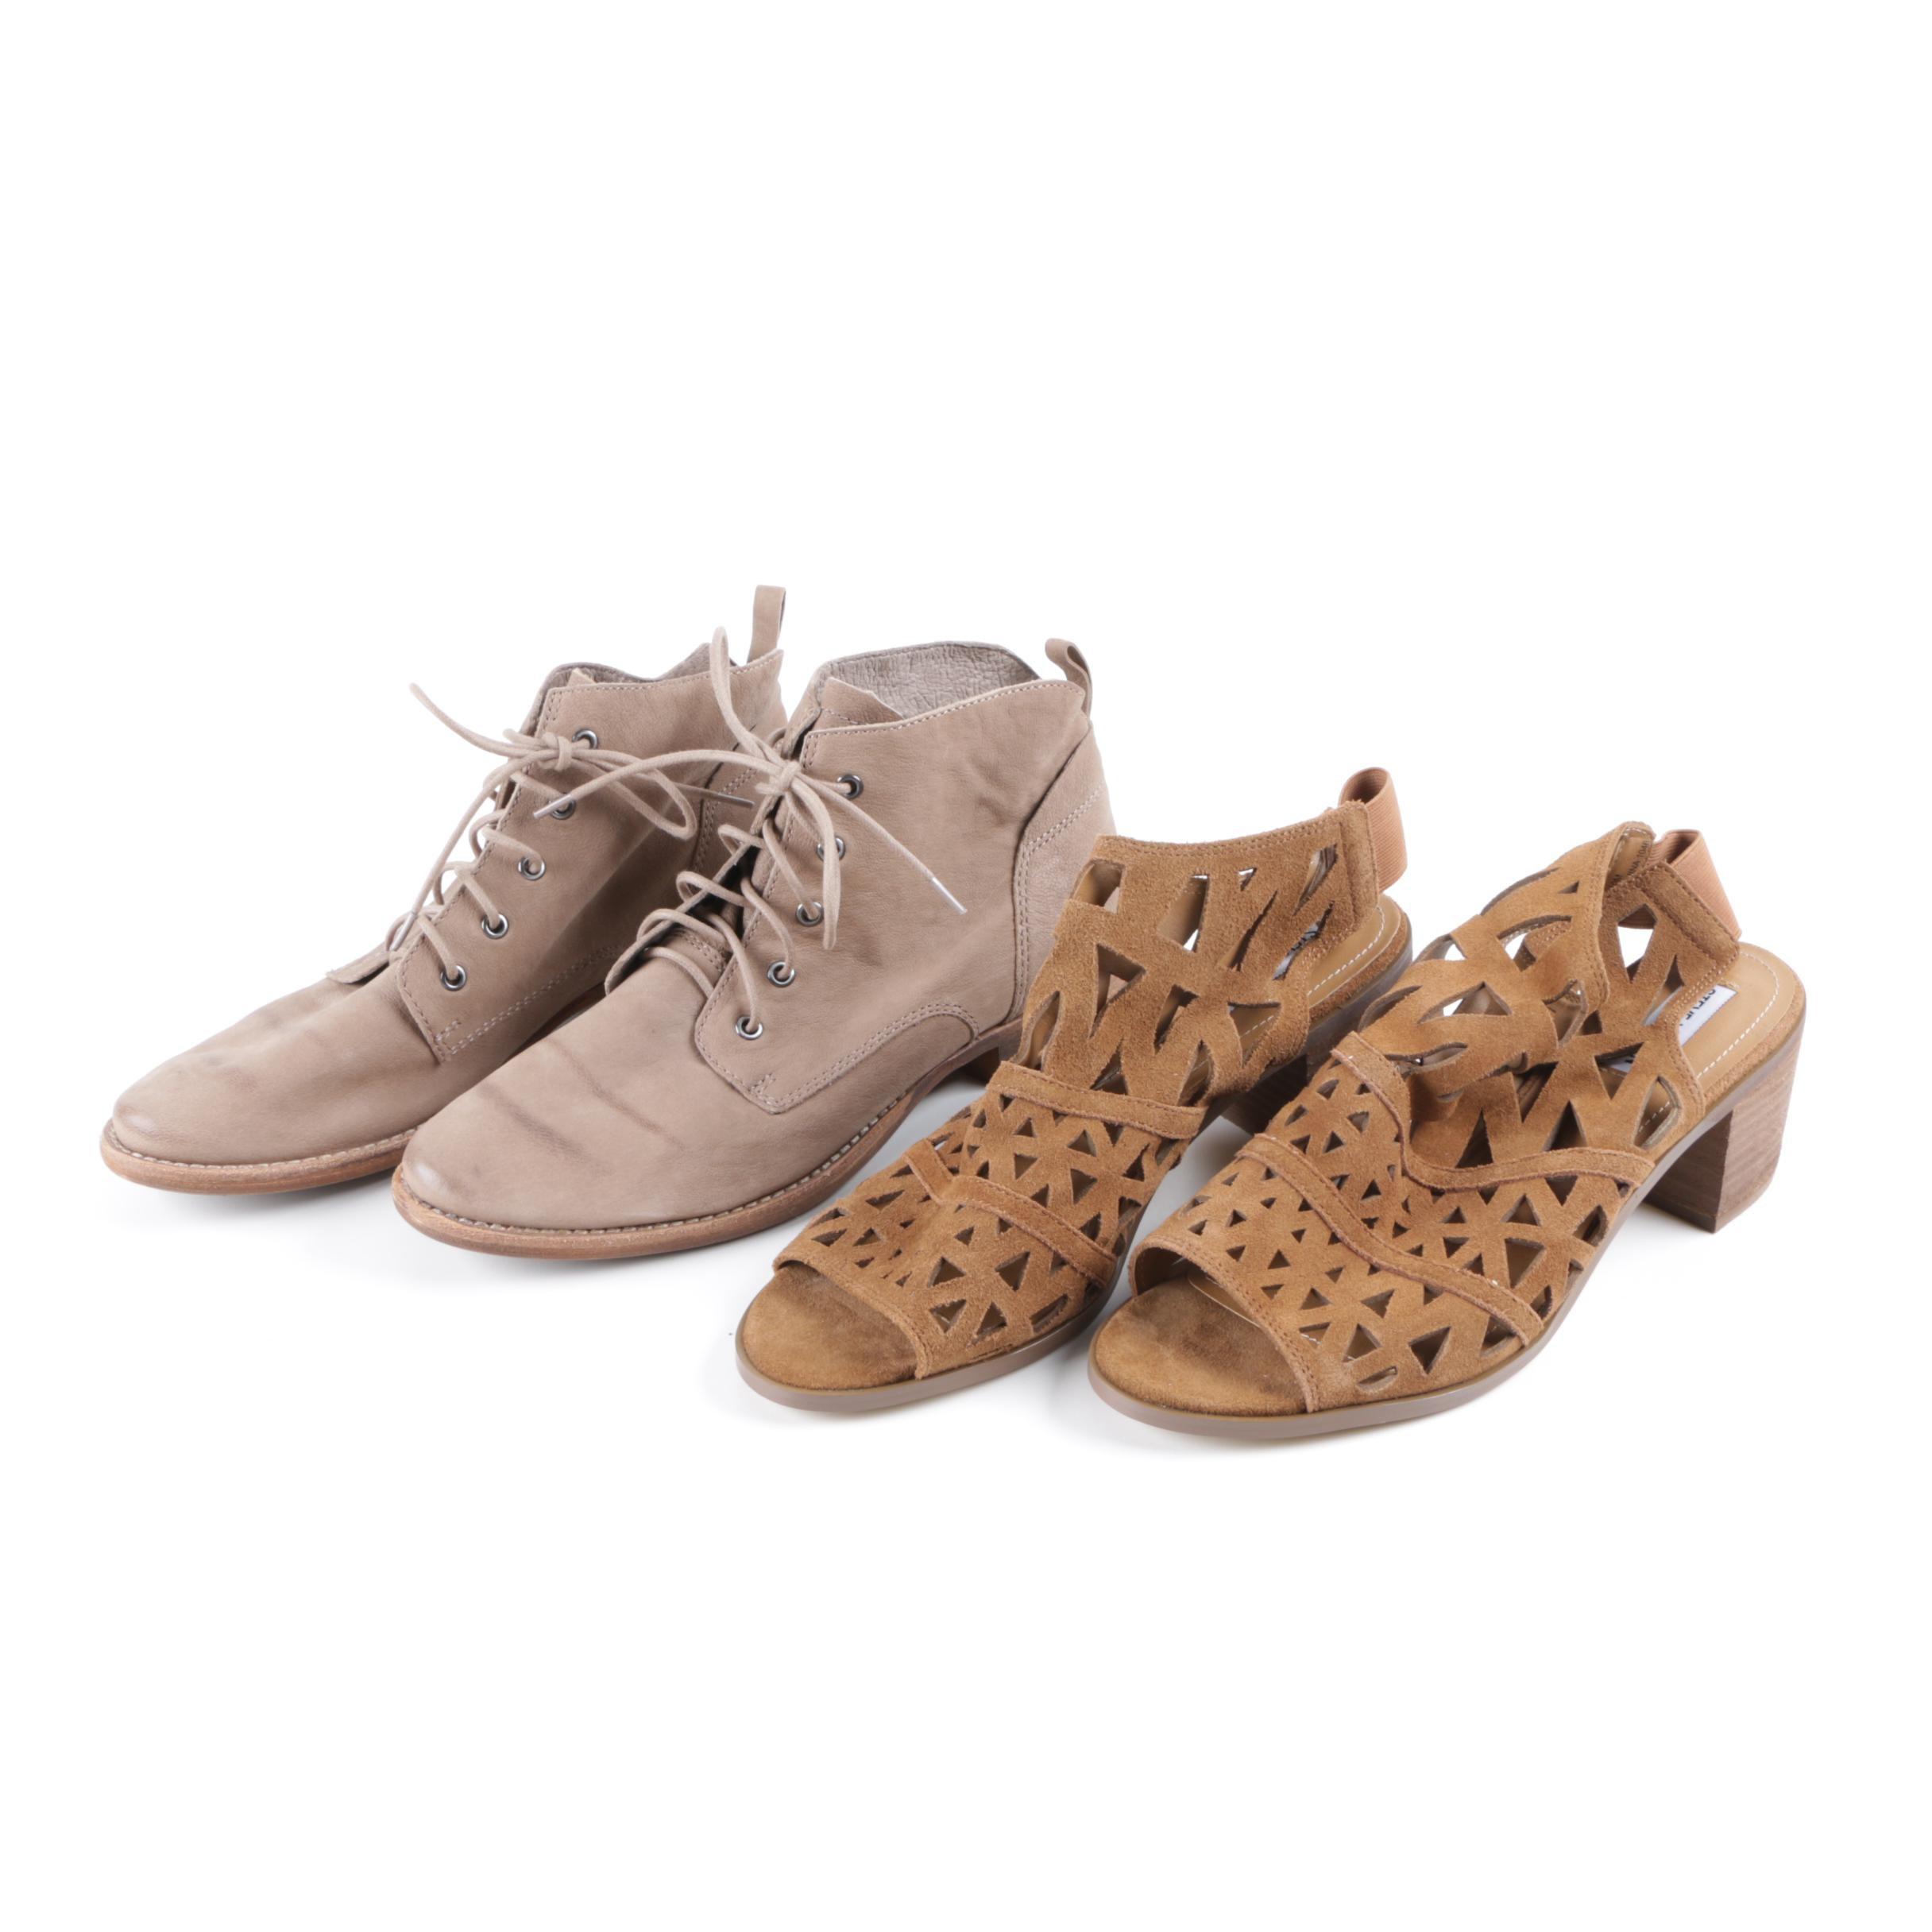 Sam Edelman Booties and Steve Madden Estee Leather Upper Heeled Sandals